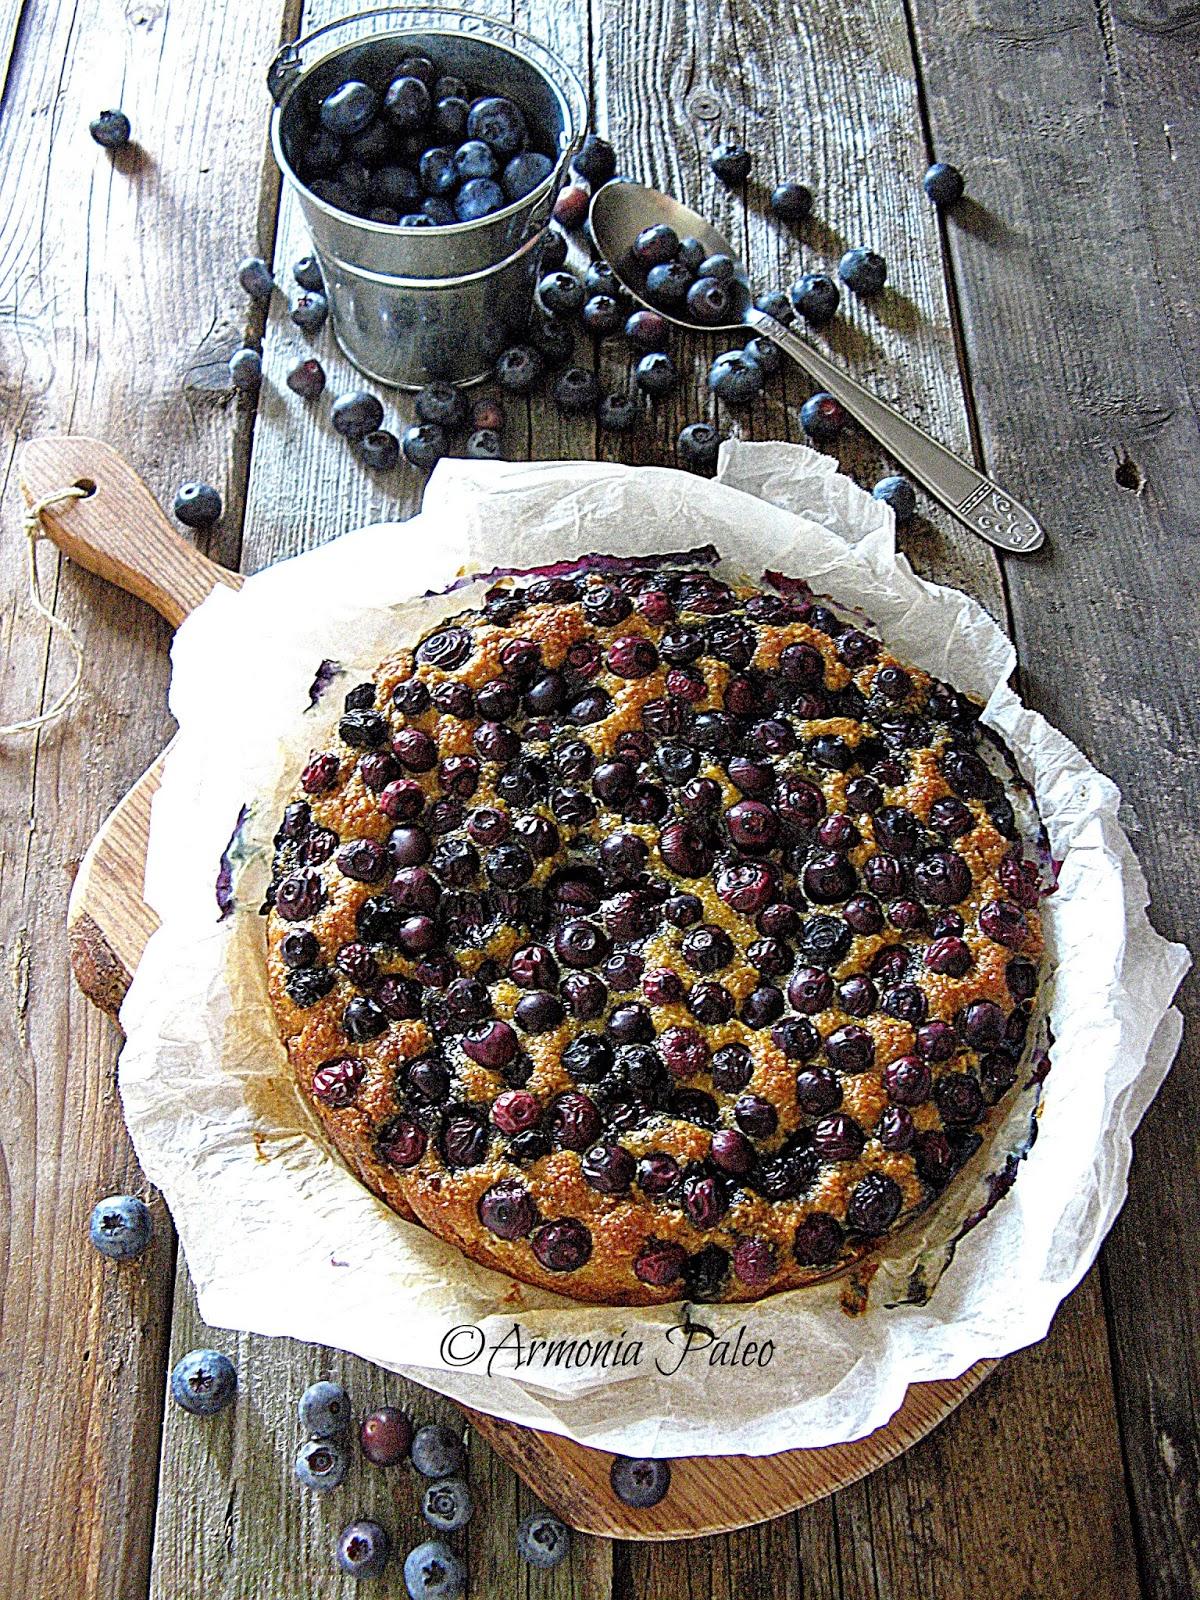 Mustikkapiiras - Torta di Mirtilli Finlandese di Armonia Paleo